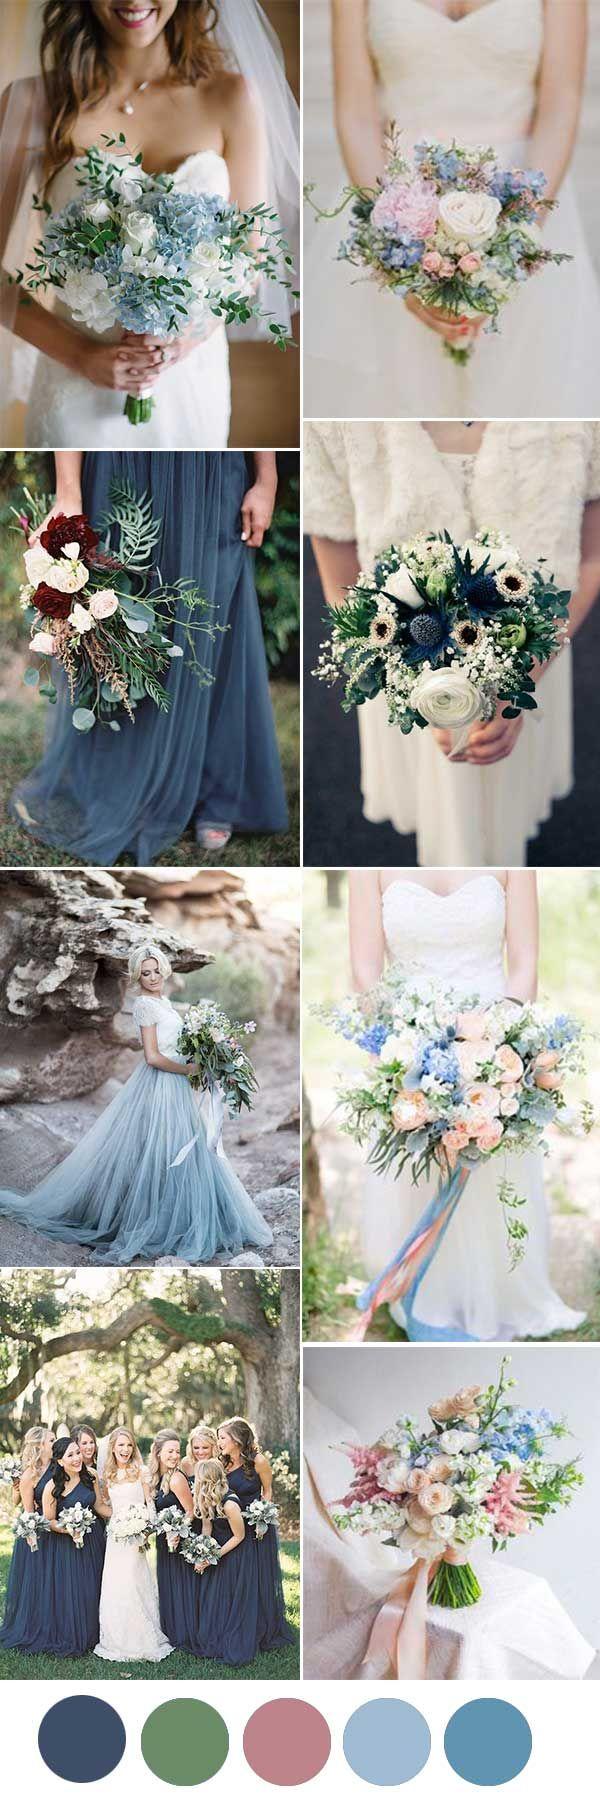 PRETTIEST SHADE OF BLUE WEDDING TREND IN